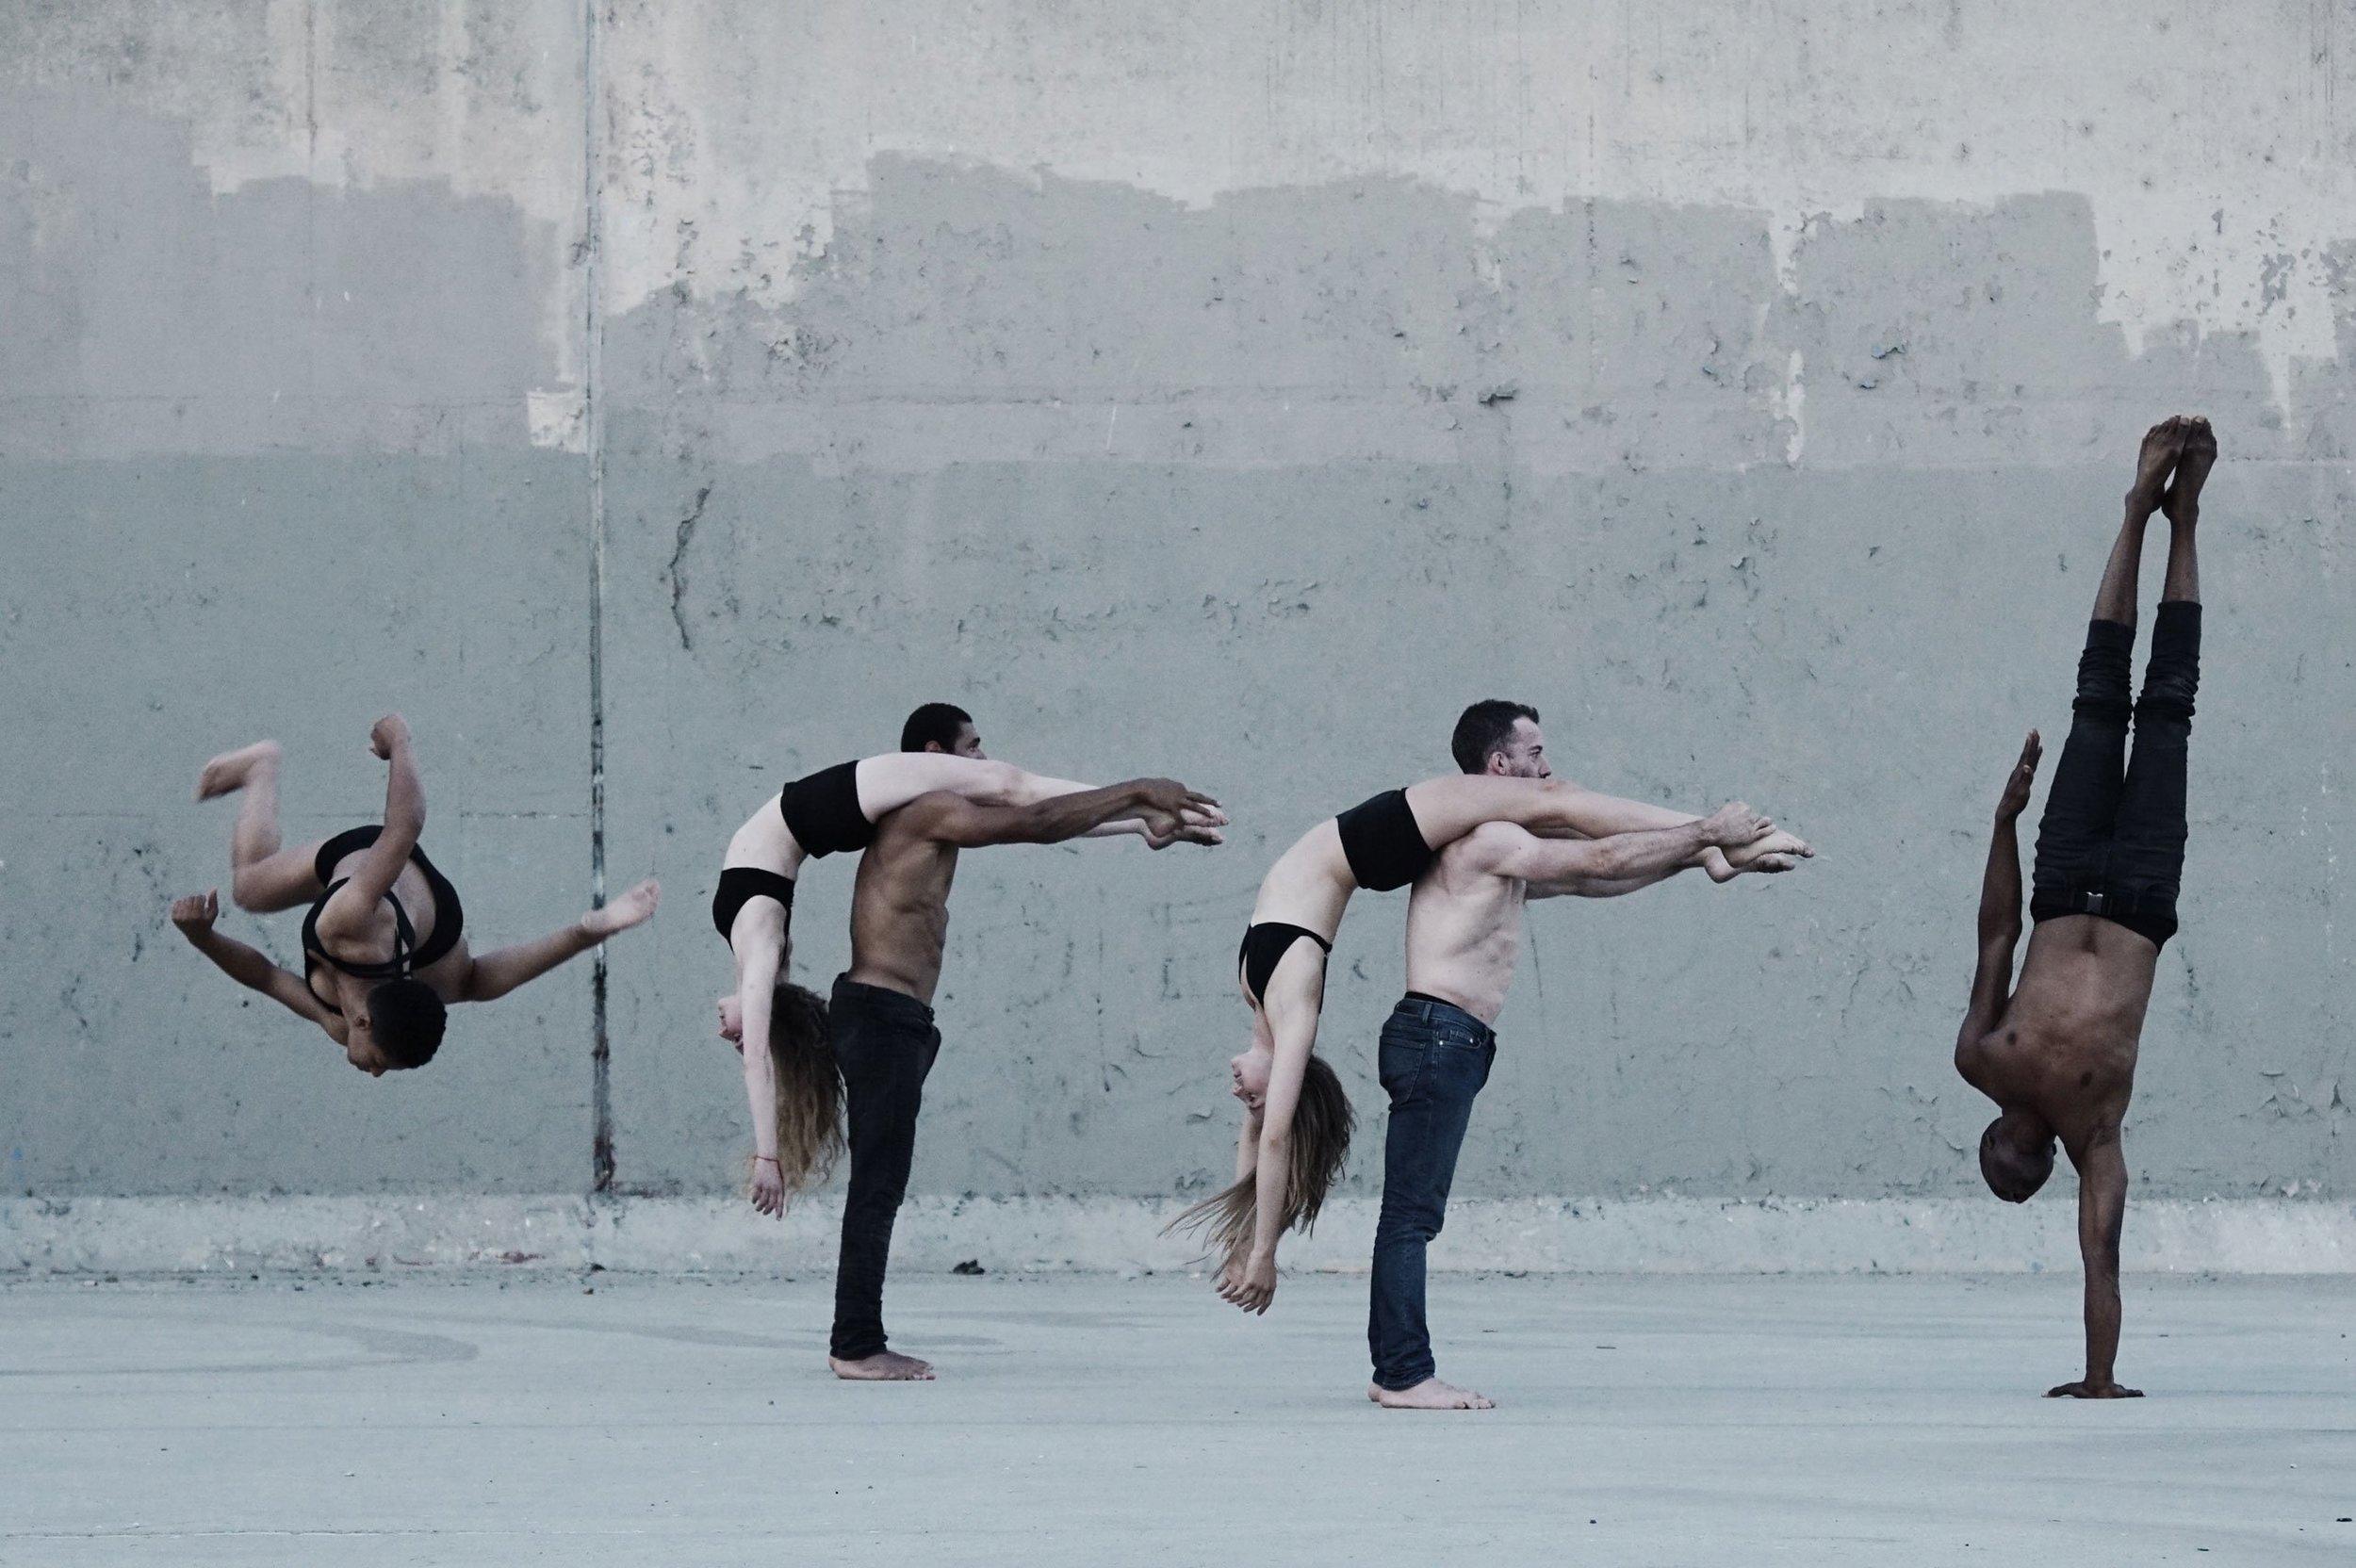 p1_cameras_and_dancers_jacob_jonas_the_company_yatzer.jpg